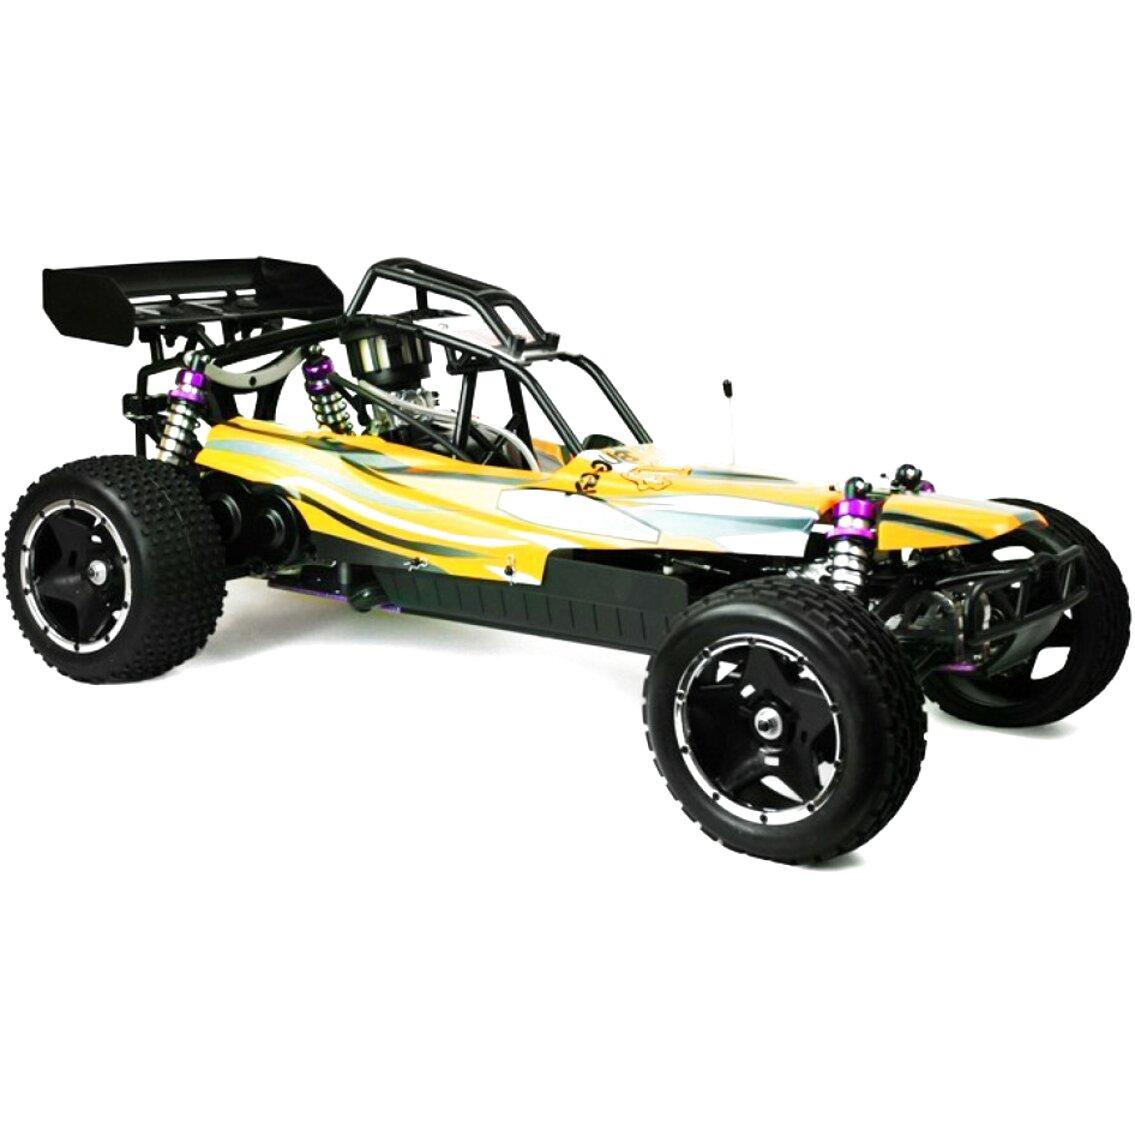 yama buggy for sale